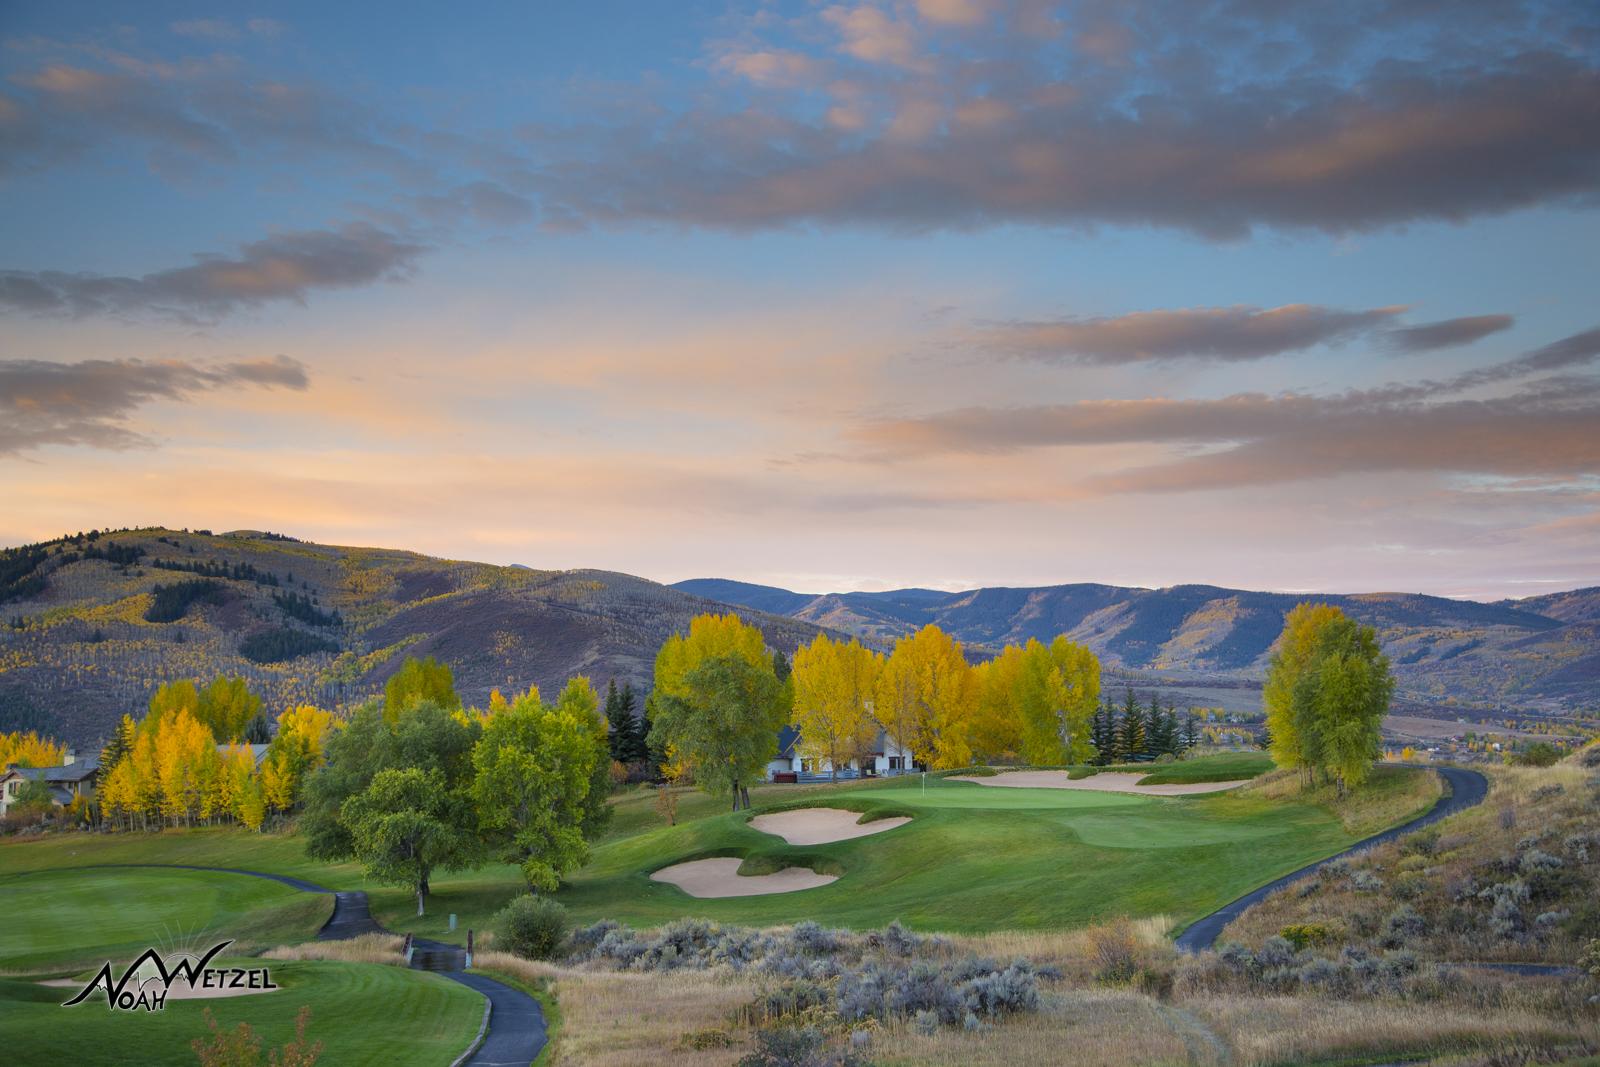 Hole 14. Sonnenalp Club. Vail Colorado